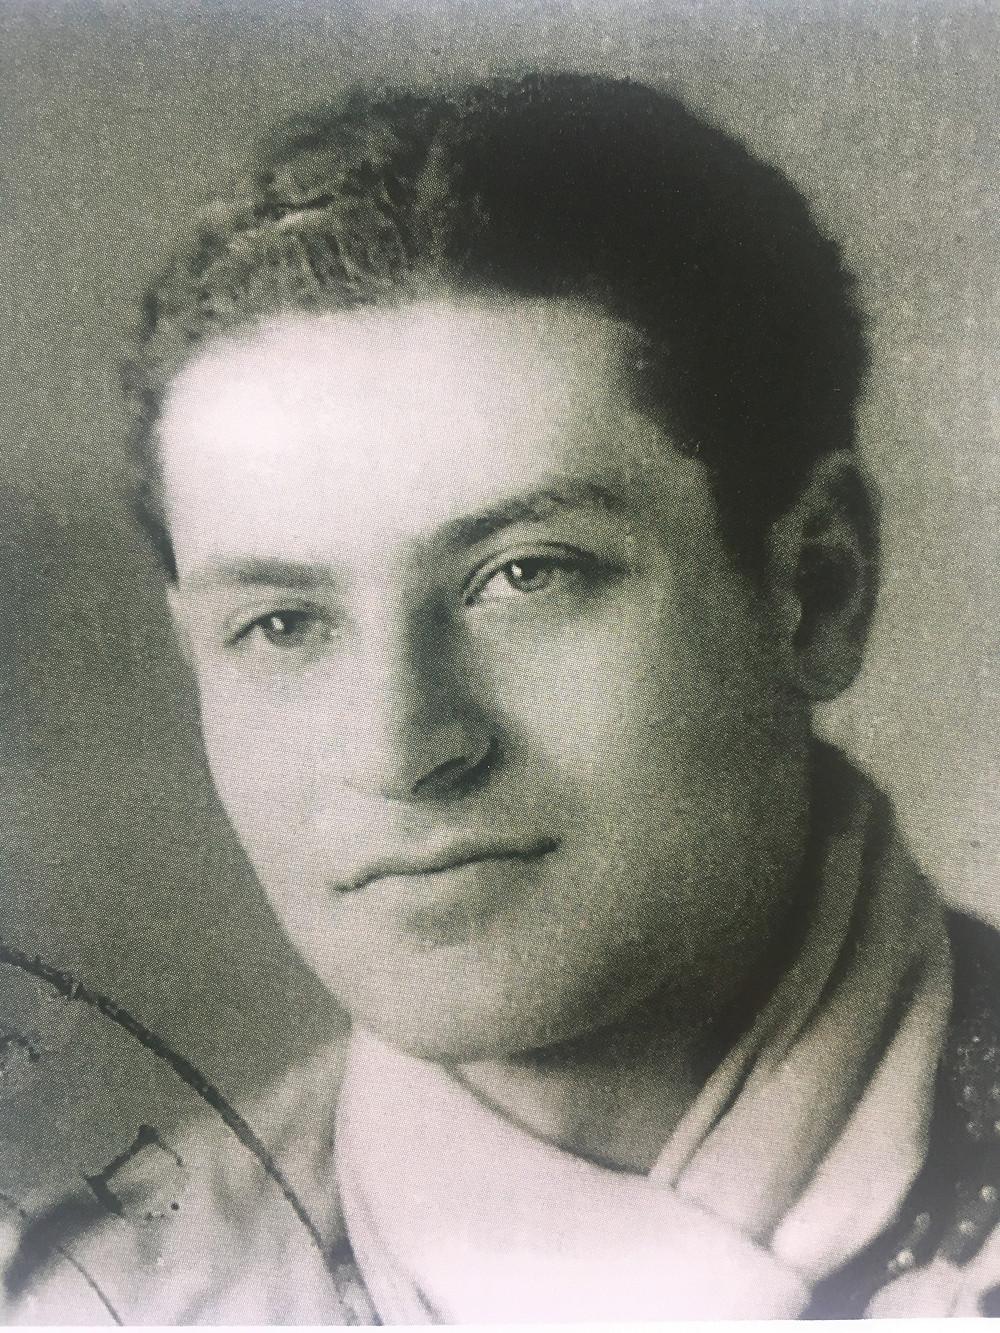 Ralph Finkler in 1944